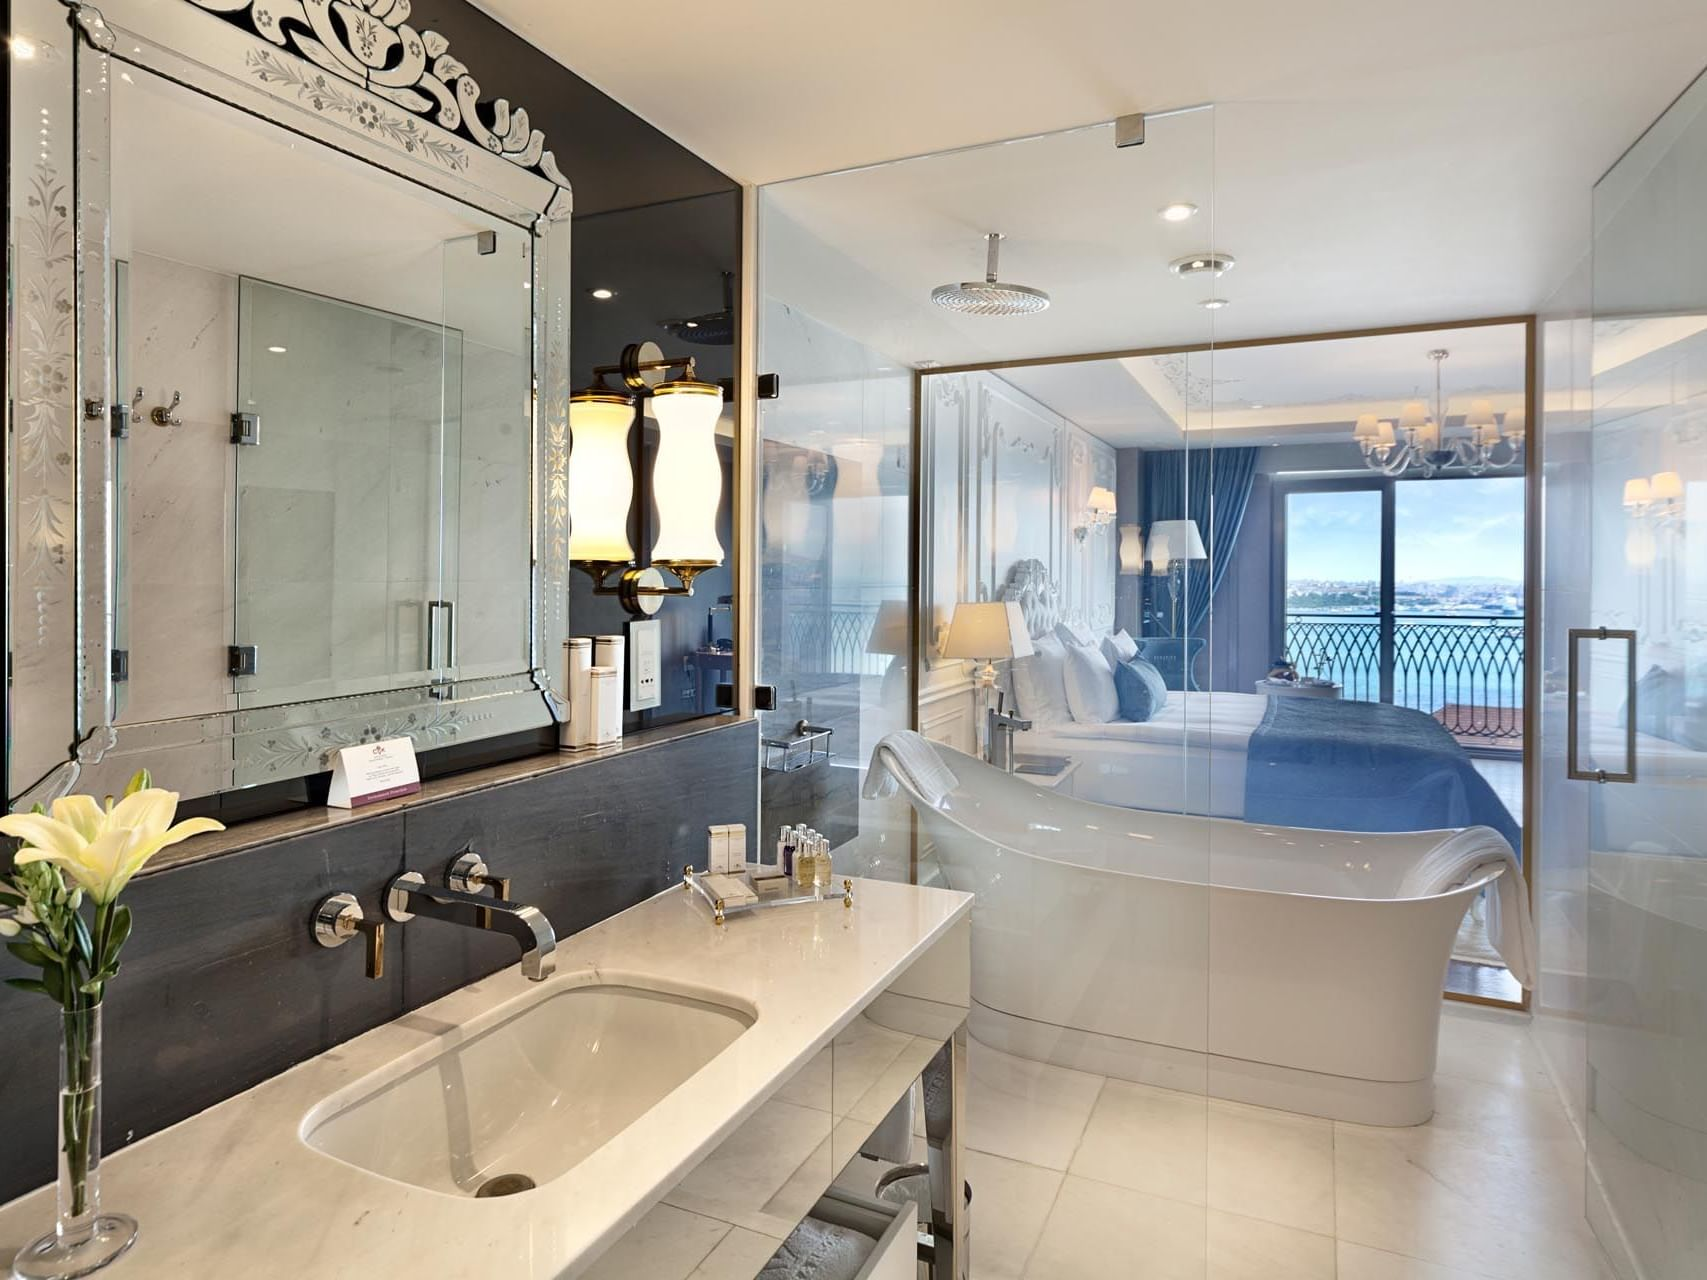 Bathroom in the Deluxe Room at CVK Park Bosphorus Hotel